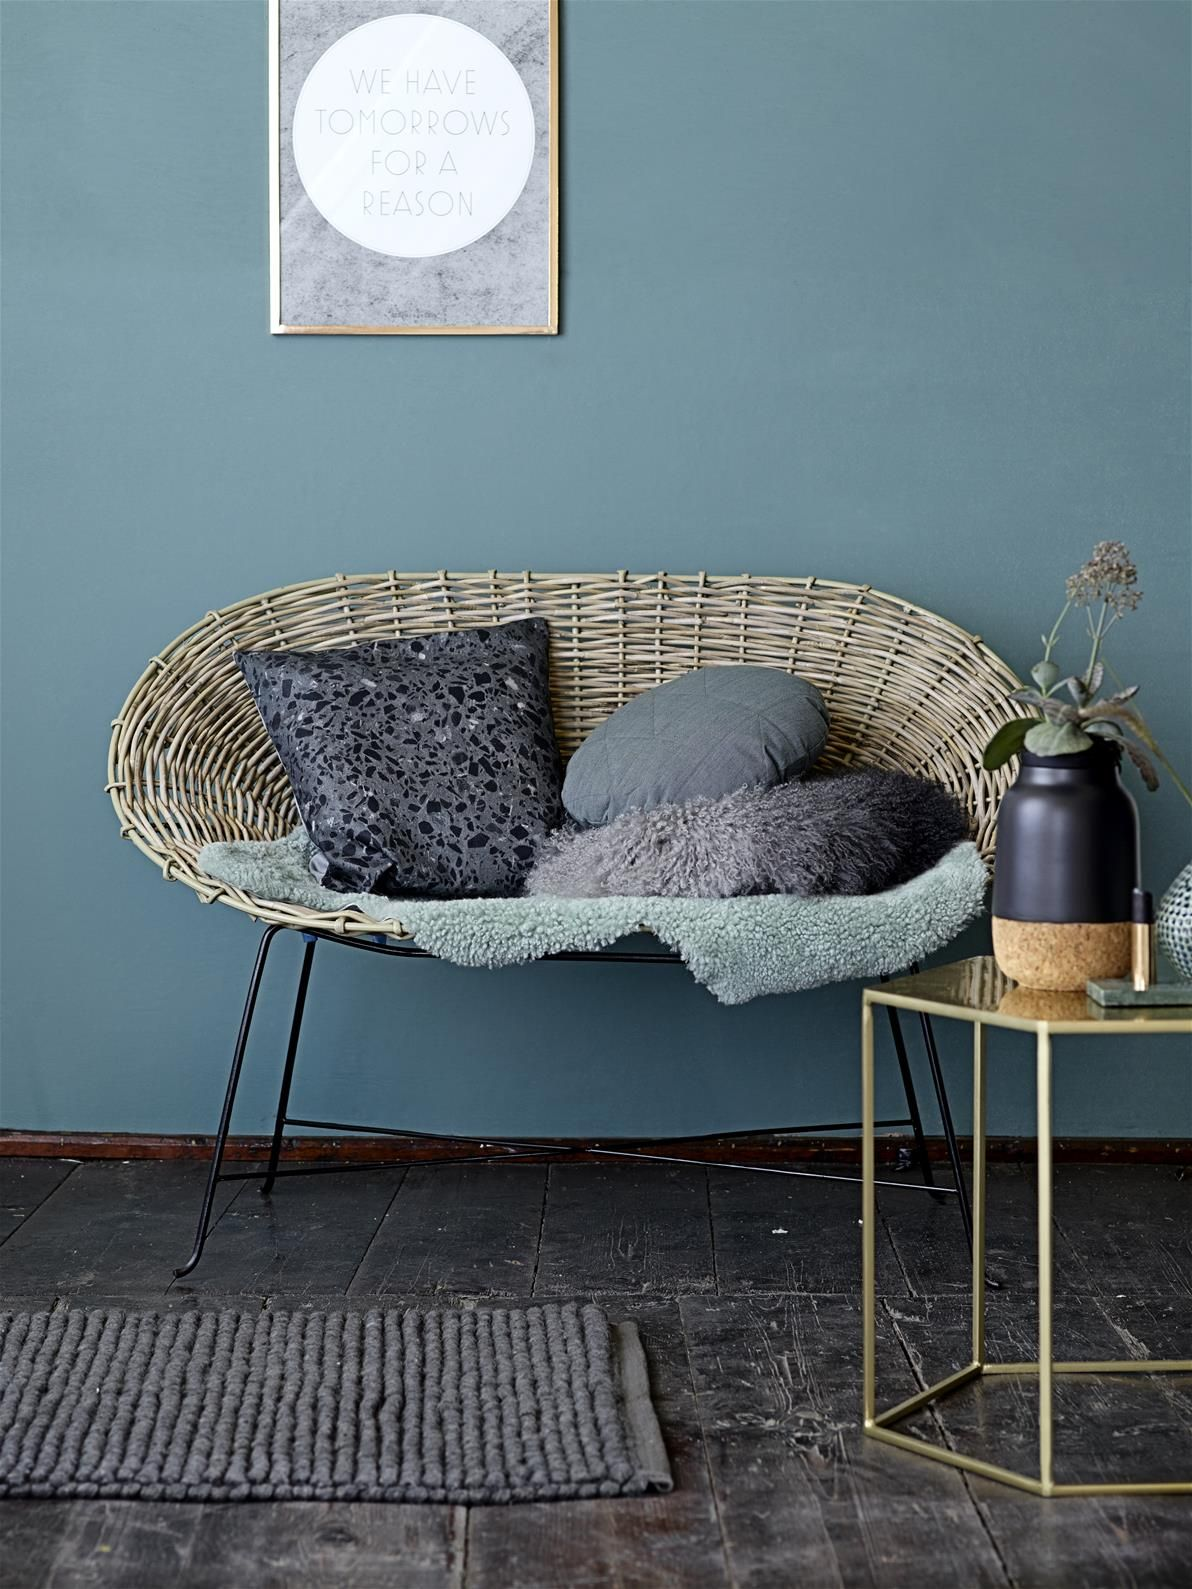 Innenarchitektur wohnzimmerfarbe trendfarbeherbstblaubloomingville  bloomingville  pinterest